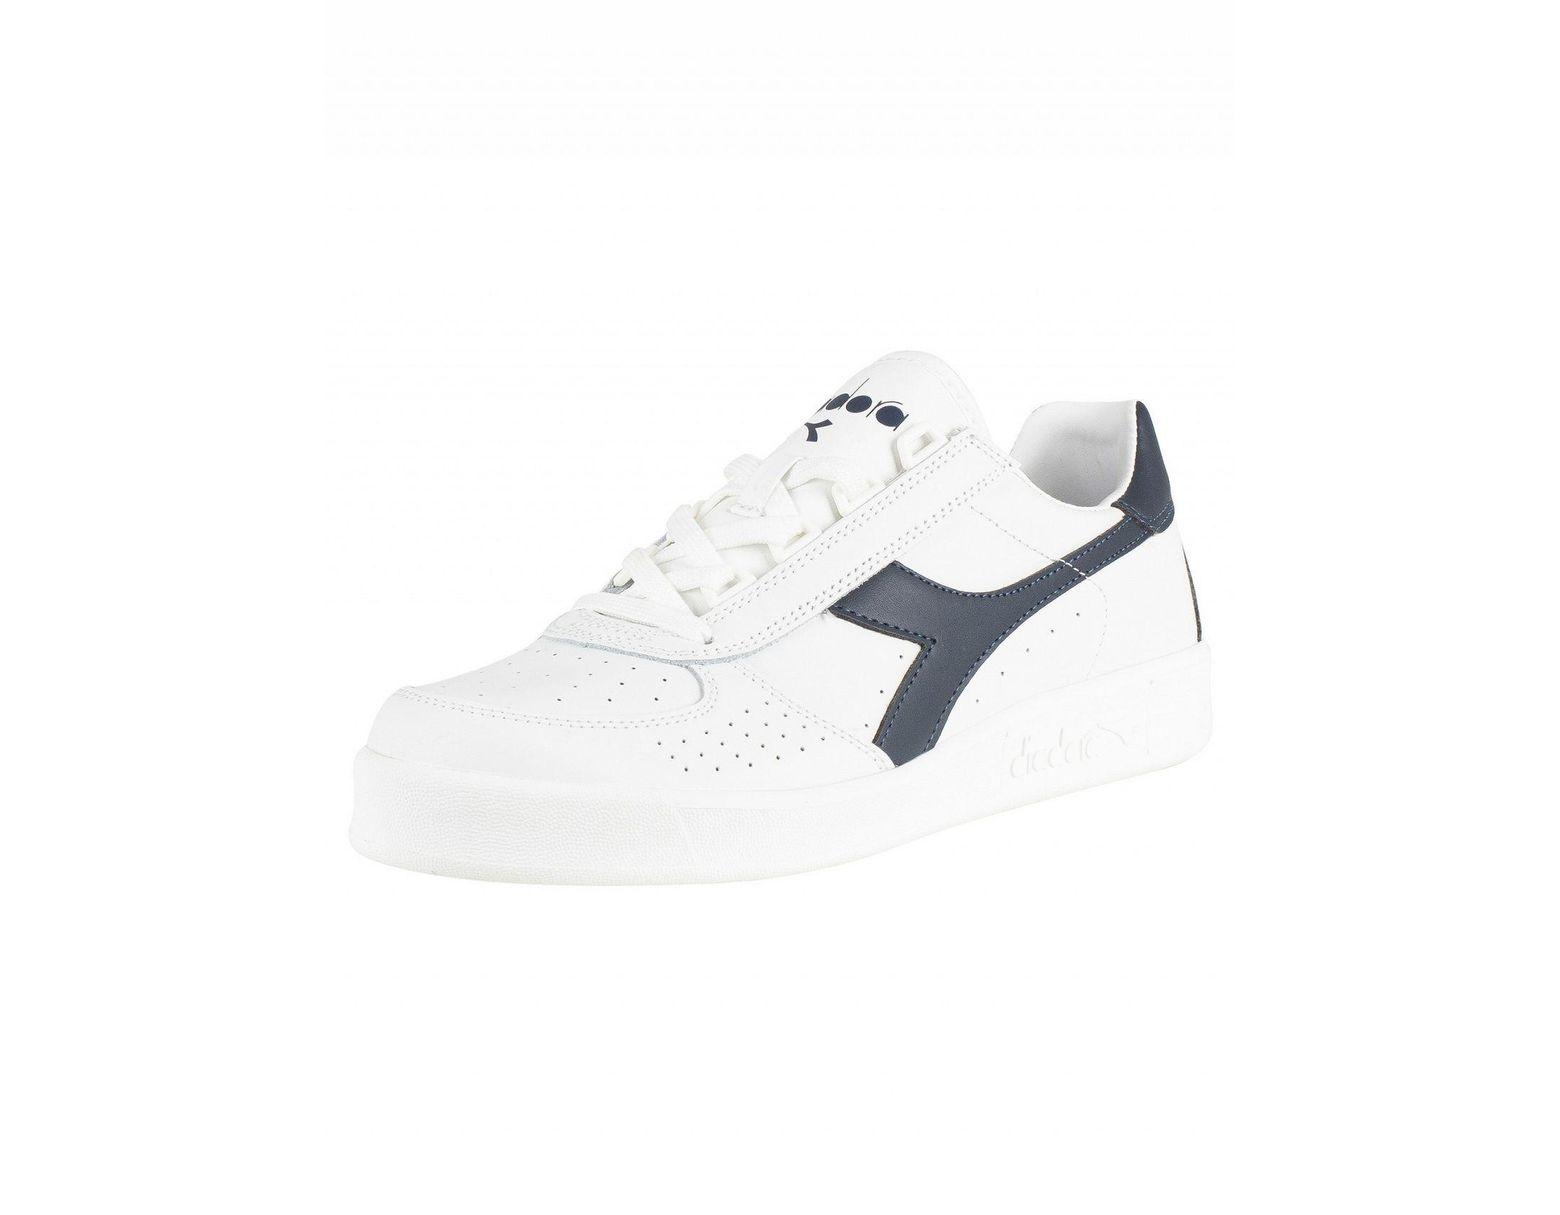 31c92255 Men's White/blue Denim B. Elite Leather Sneakers